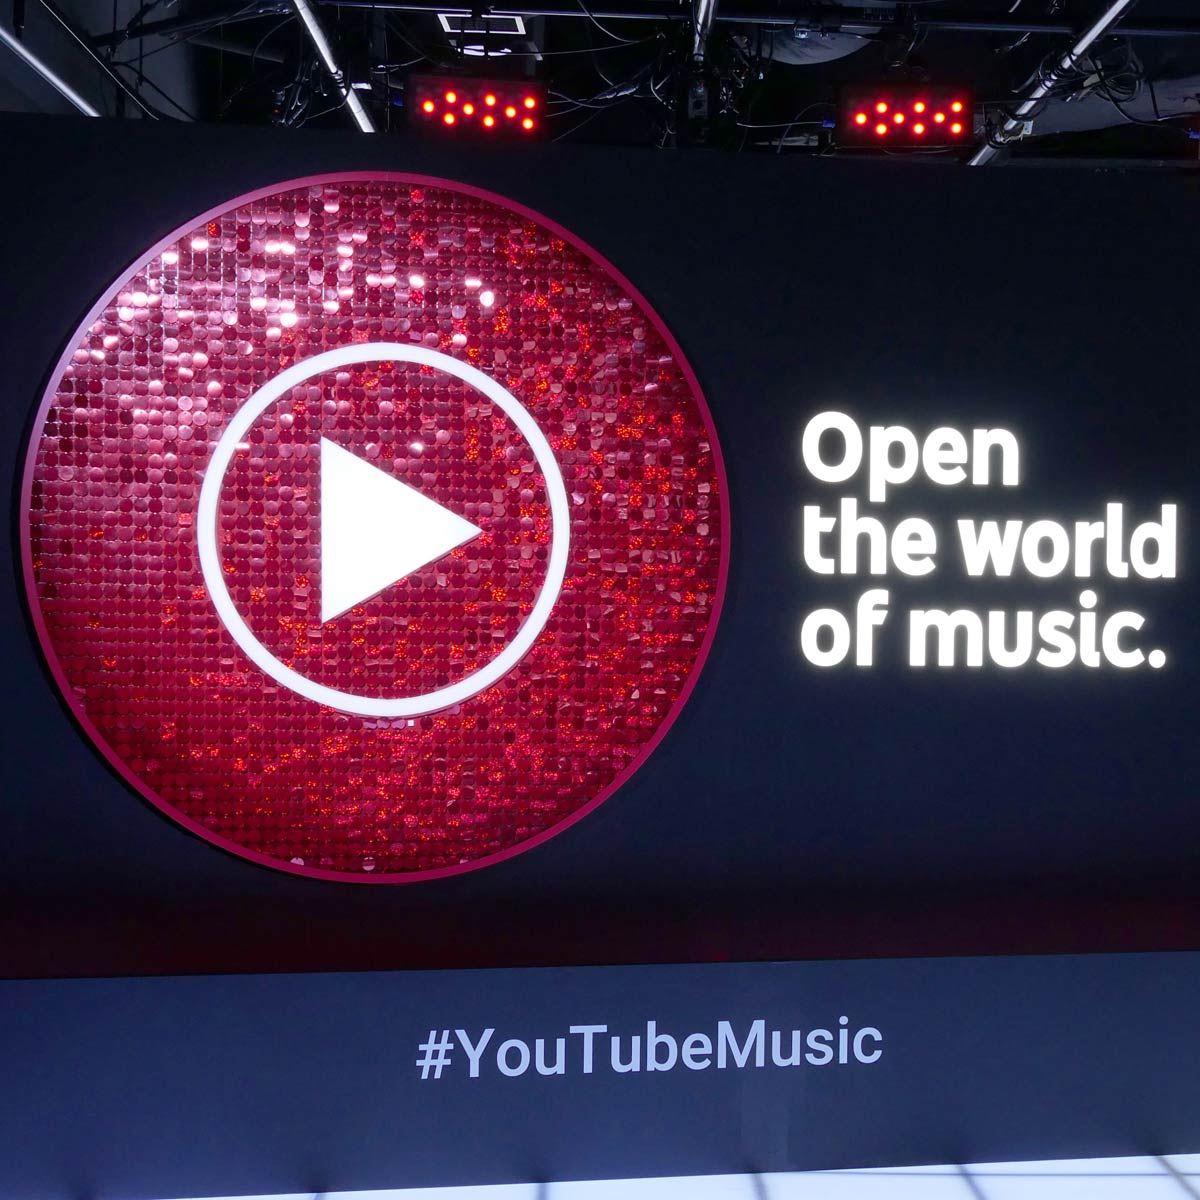 YouTubeが始めた音楽サービス「YouTube Music」とは? 無料/有料